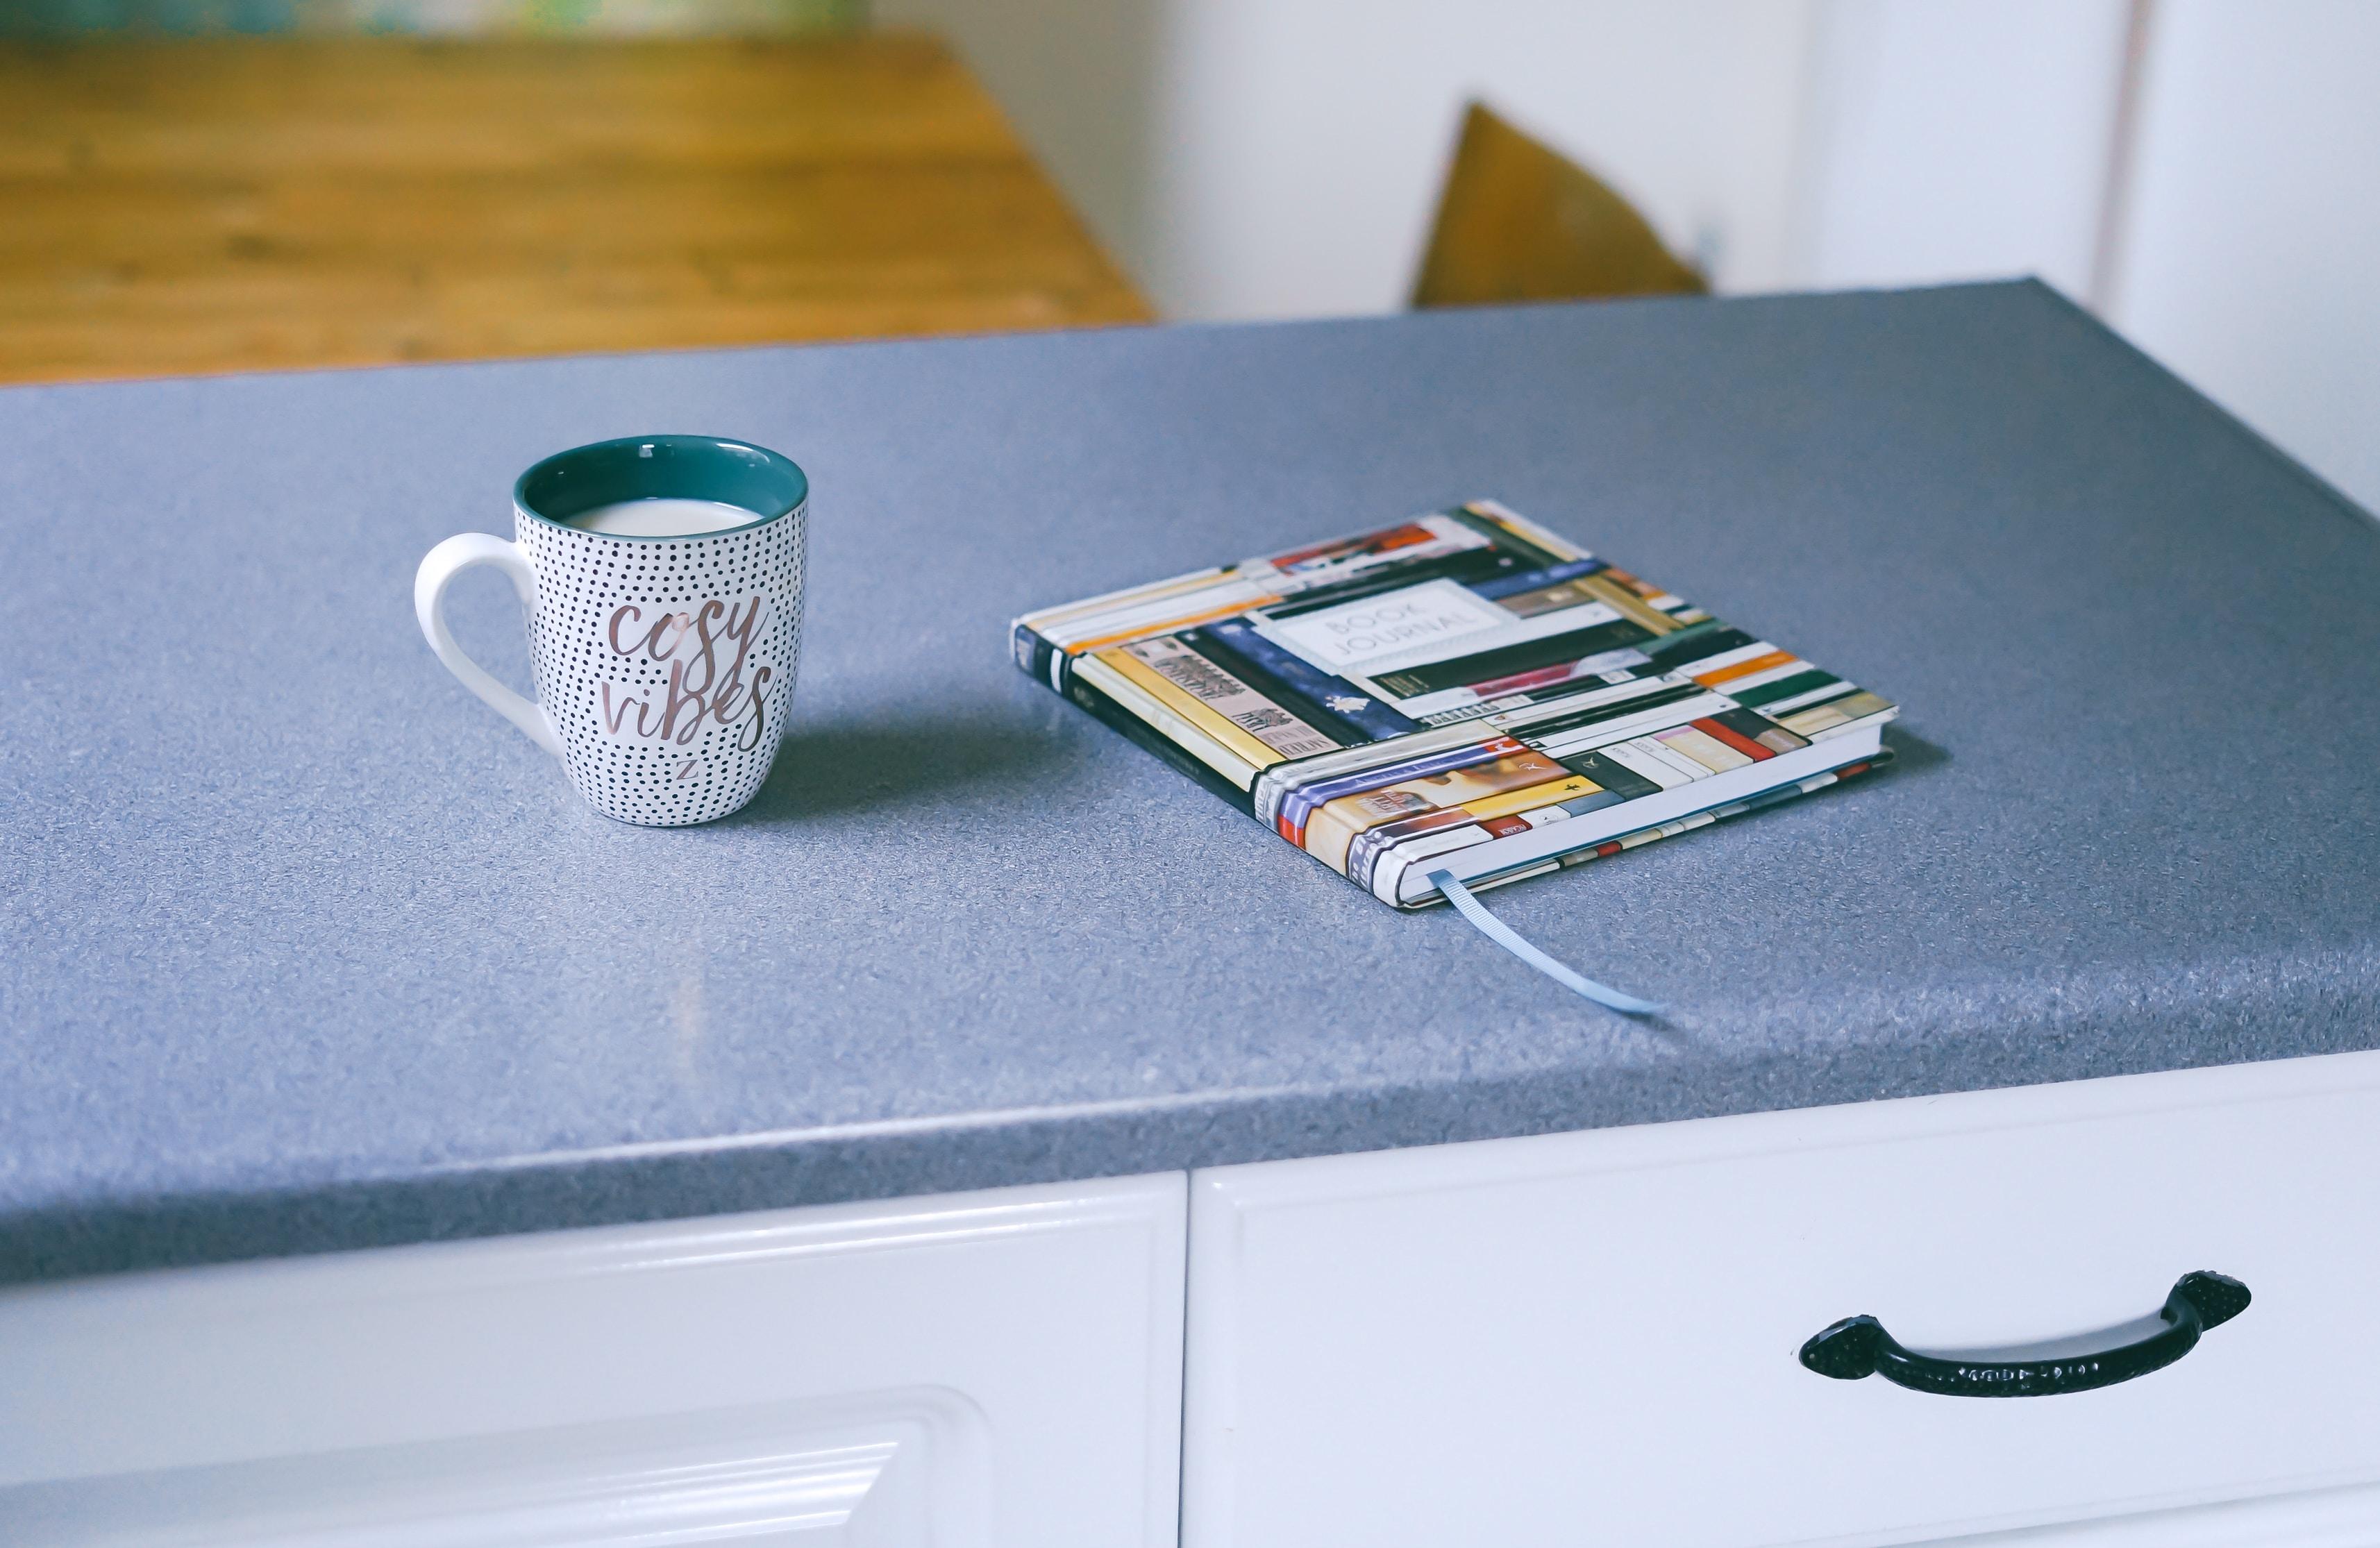 gray and white ceramic mug beside multicolored covered book